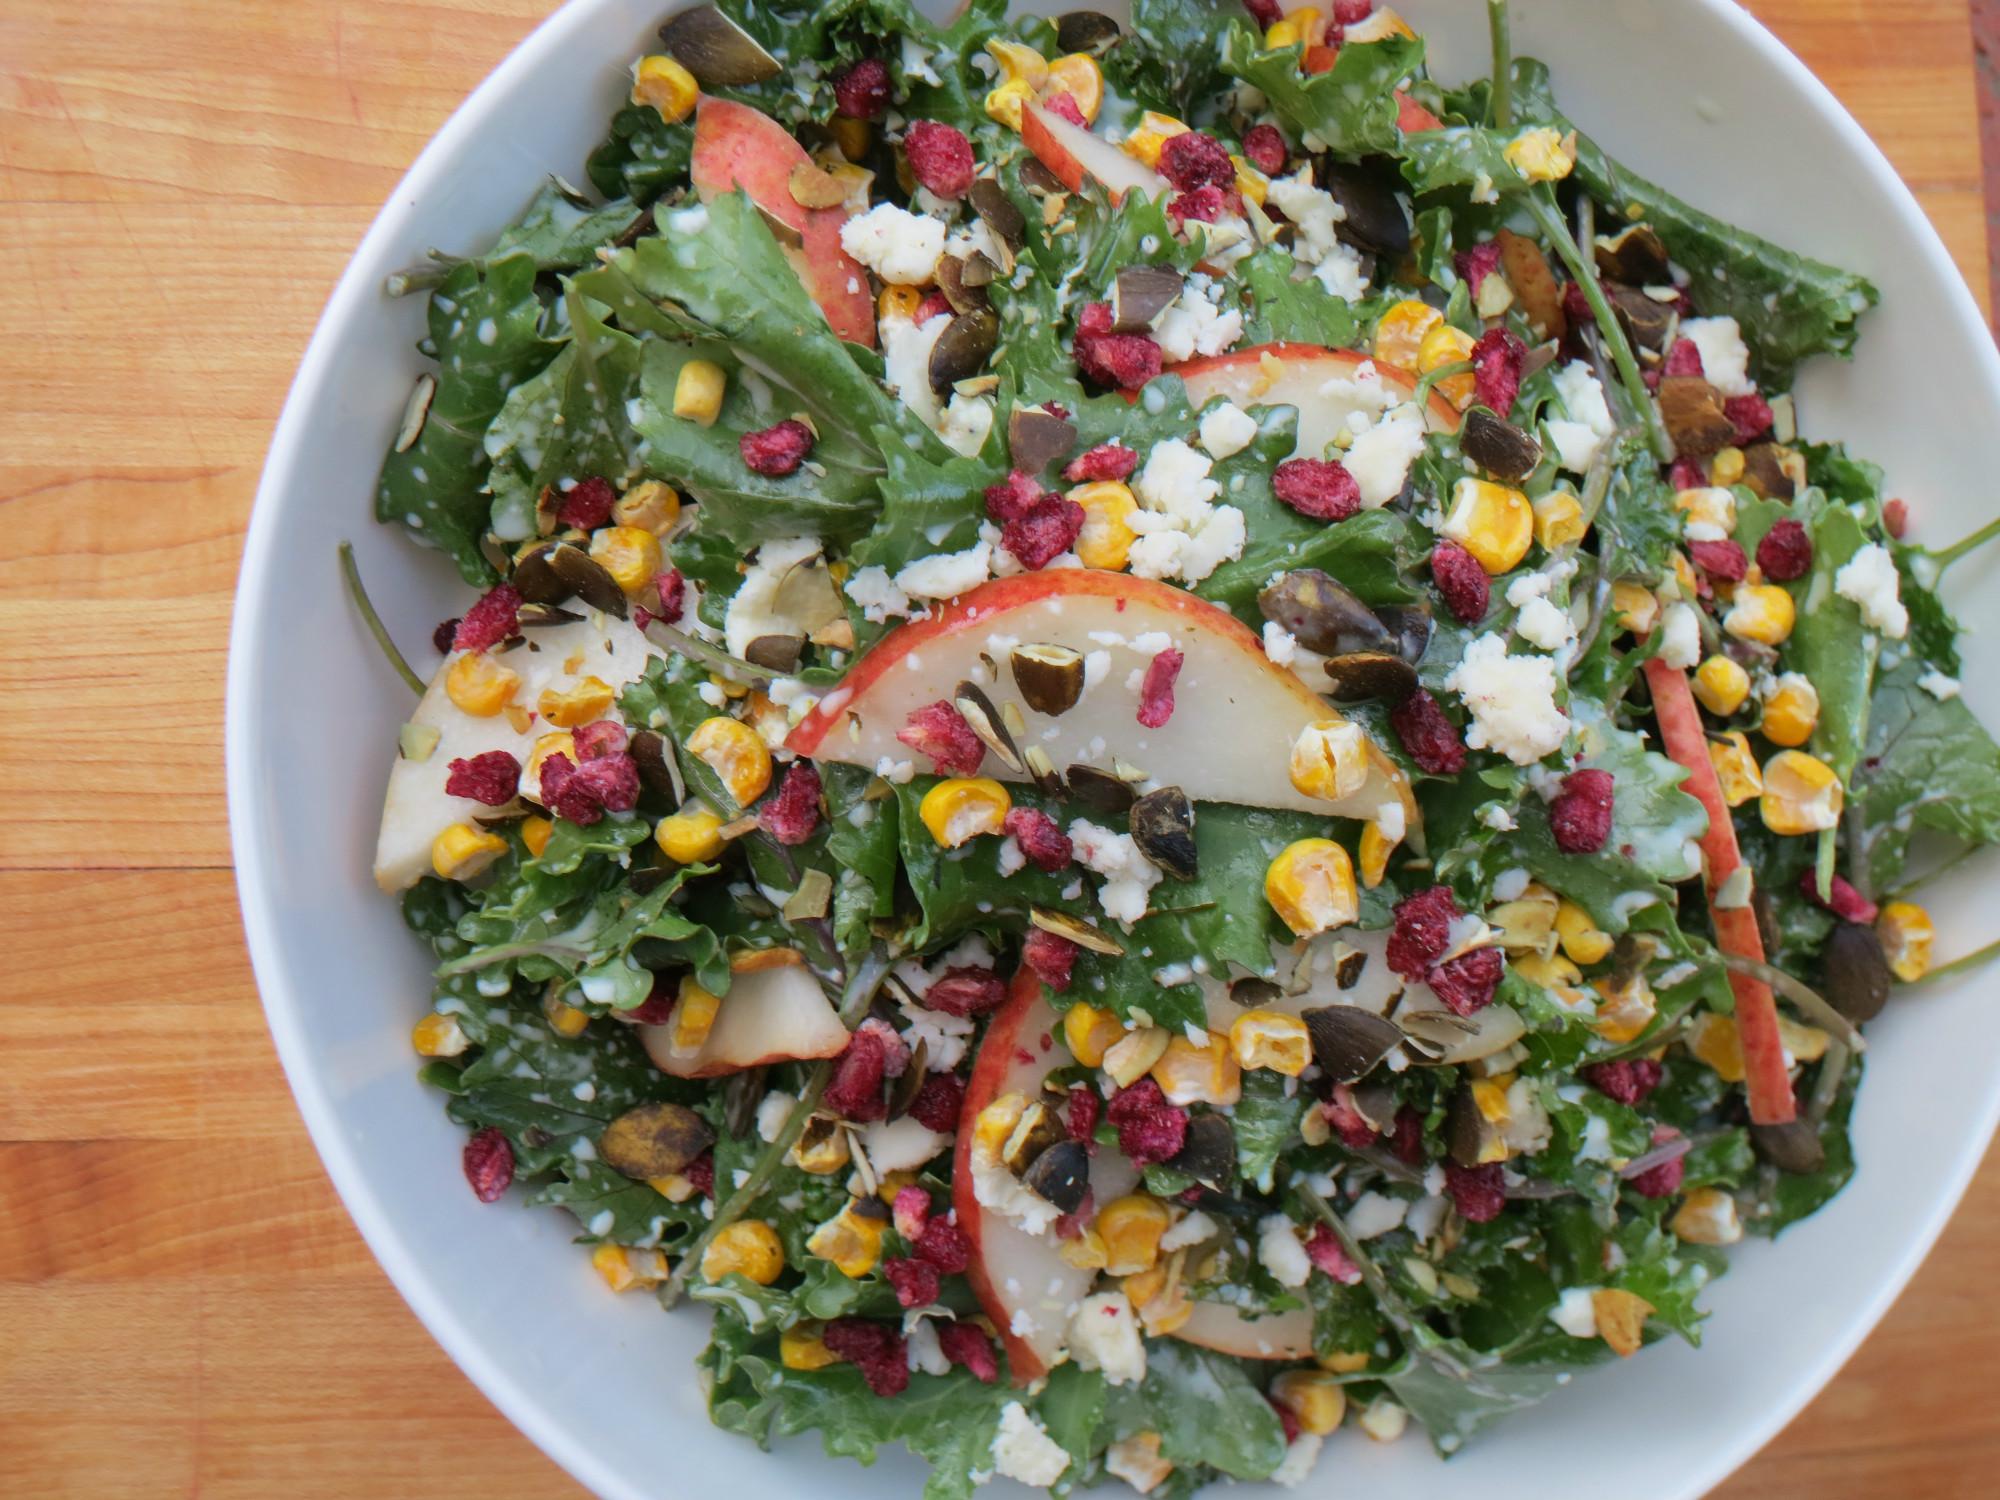 Pear salad dressing recipe